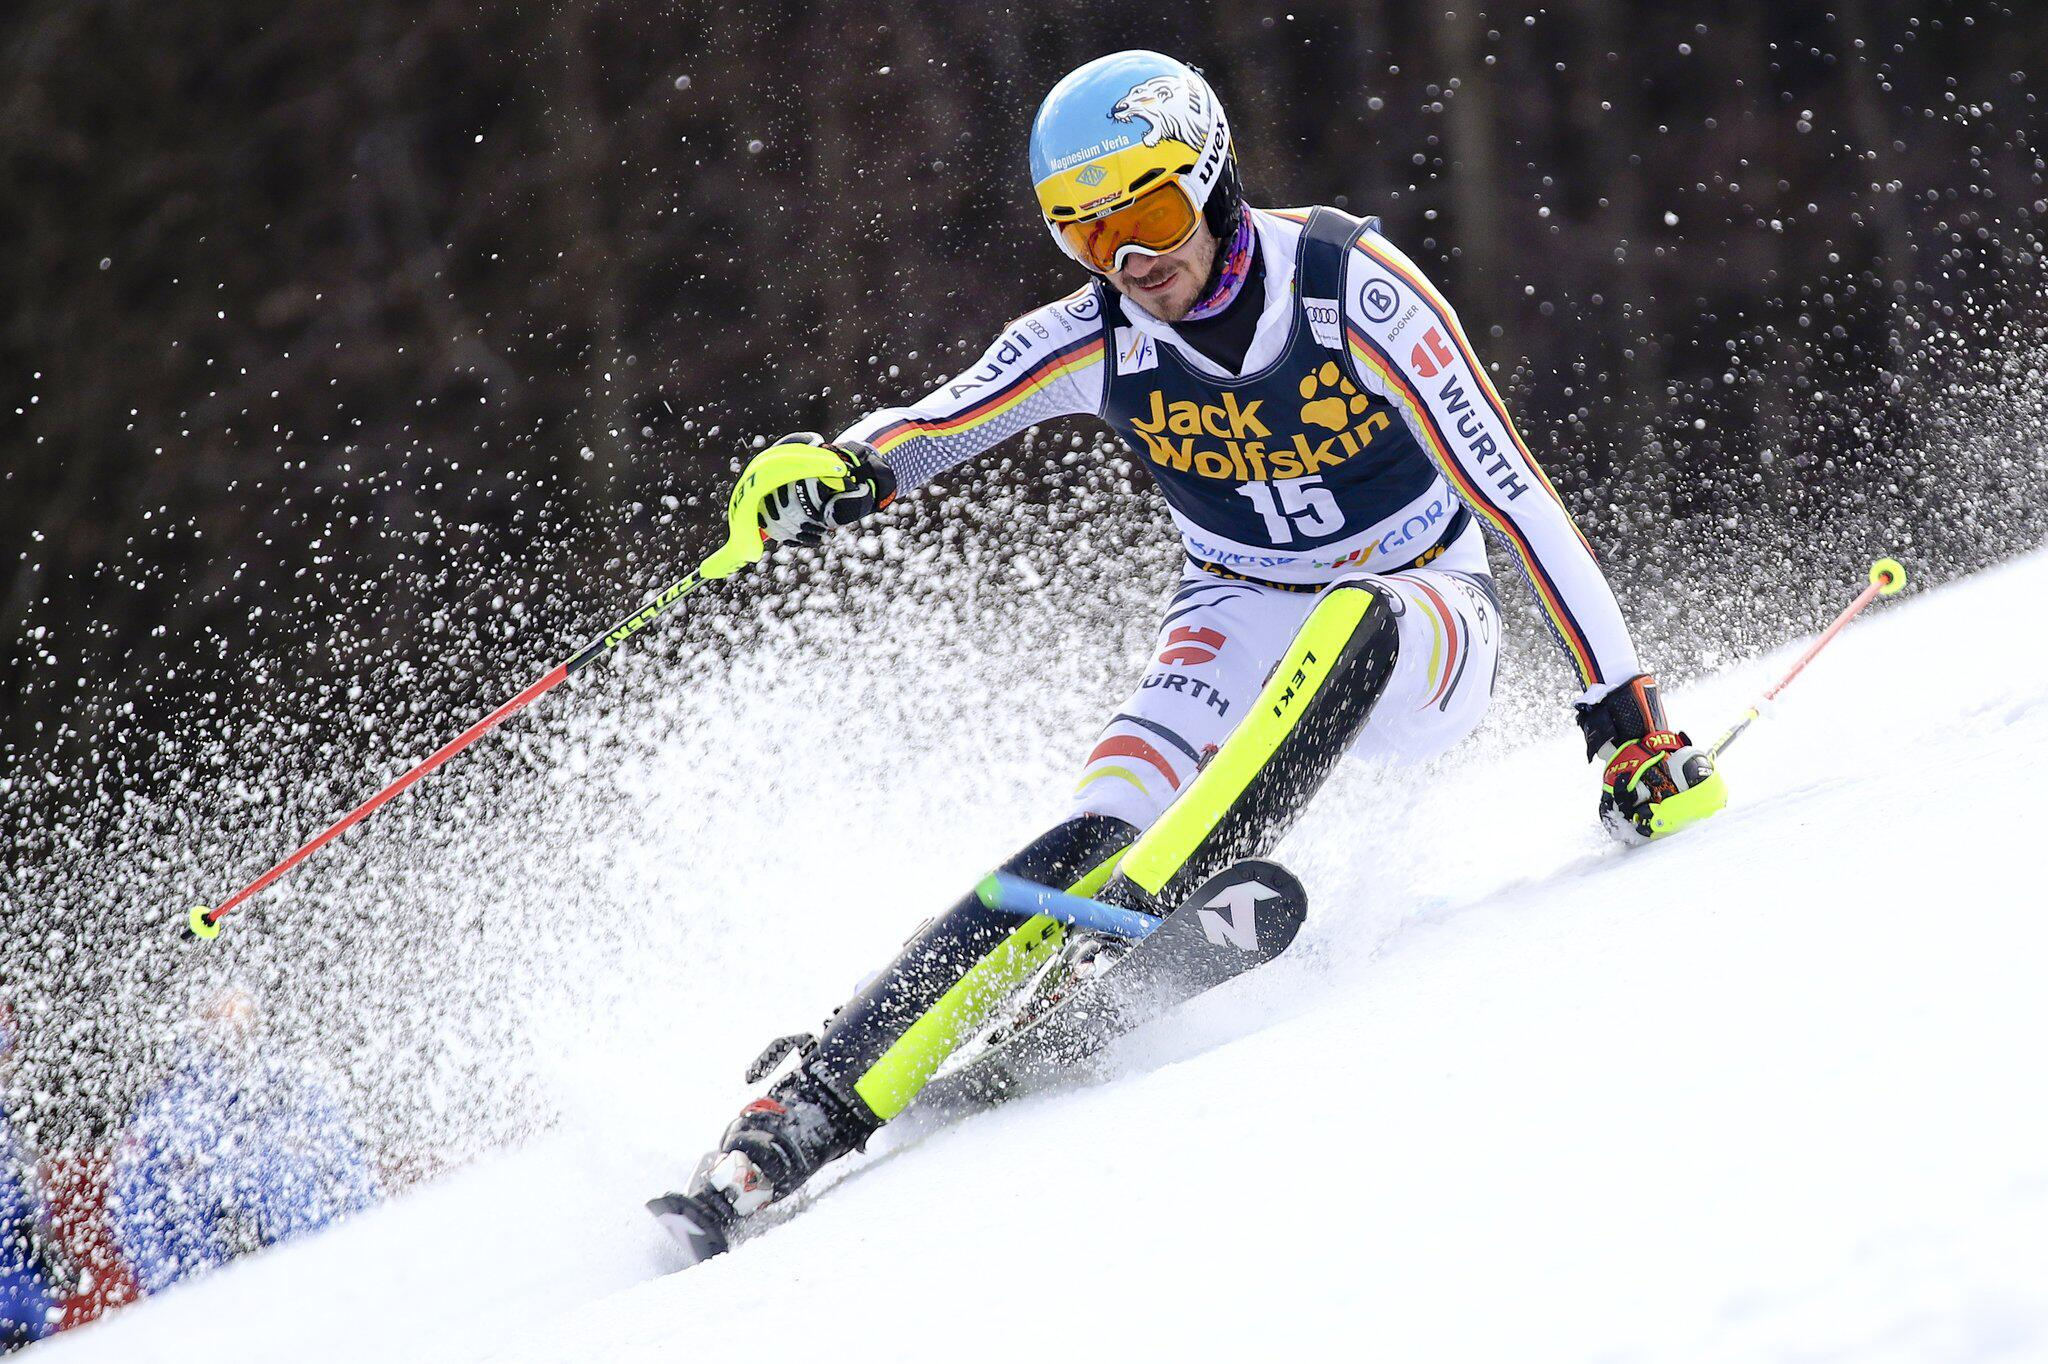 Bild zu Felix Neureuther, Ski alpin, Ski, Weltcup, Slalom, Kranjska Gora